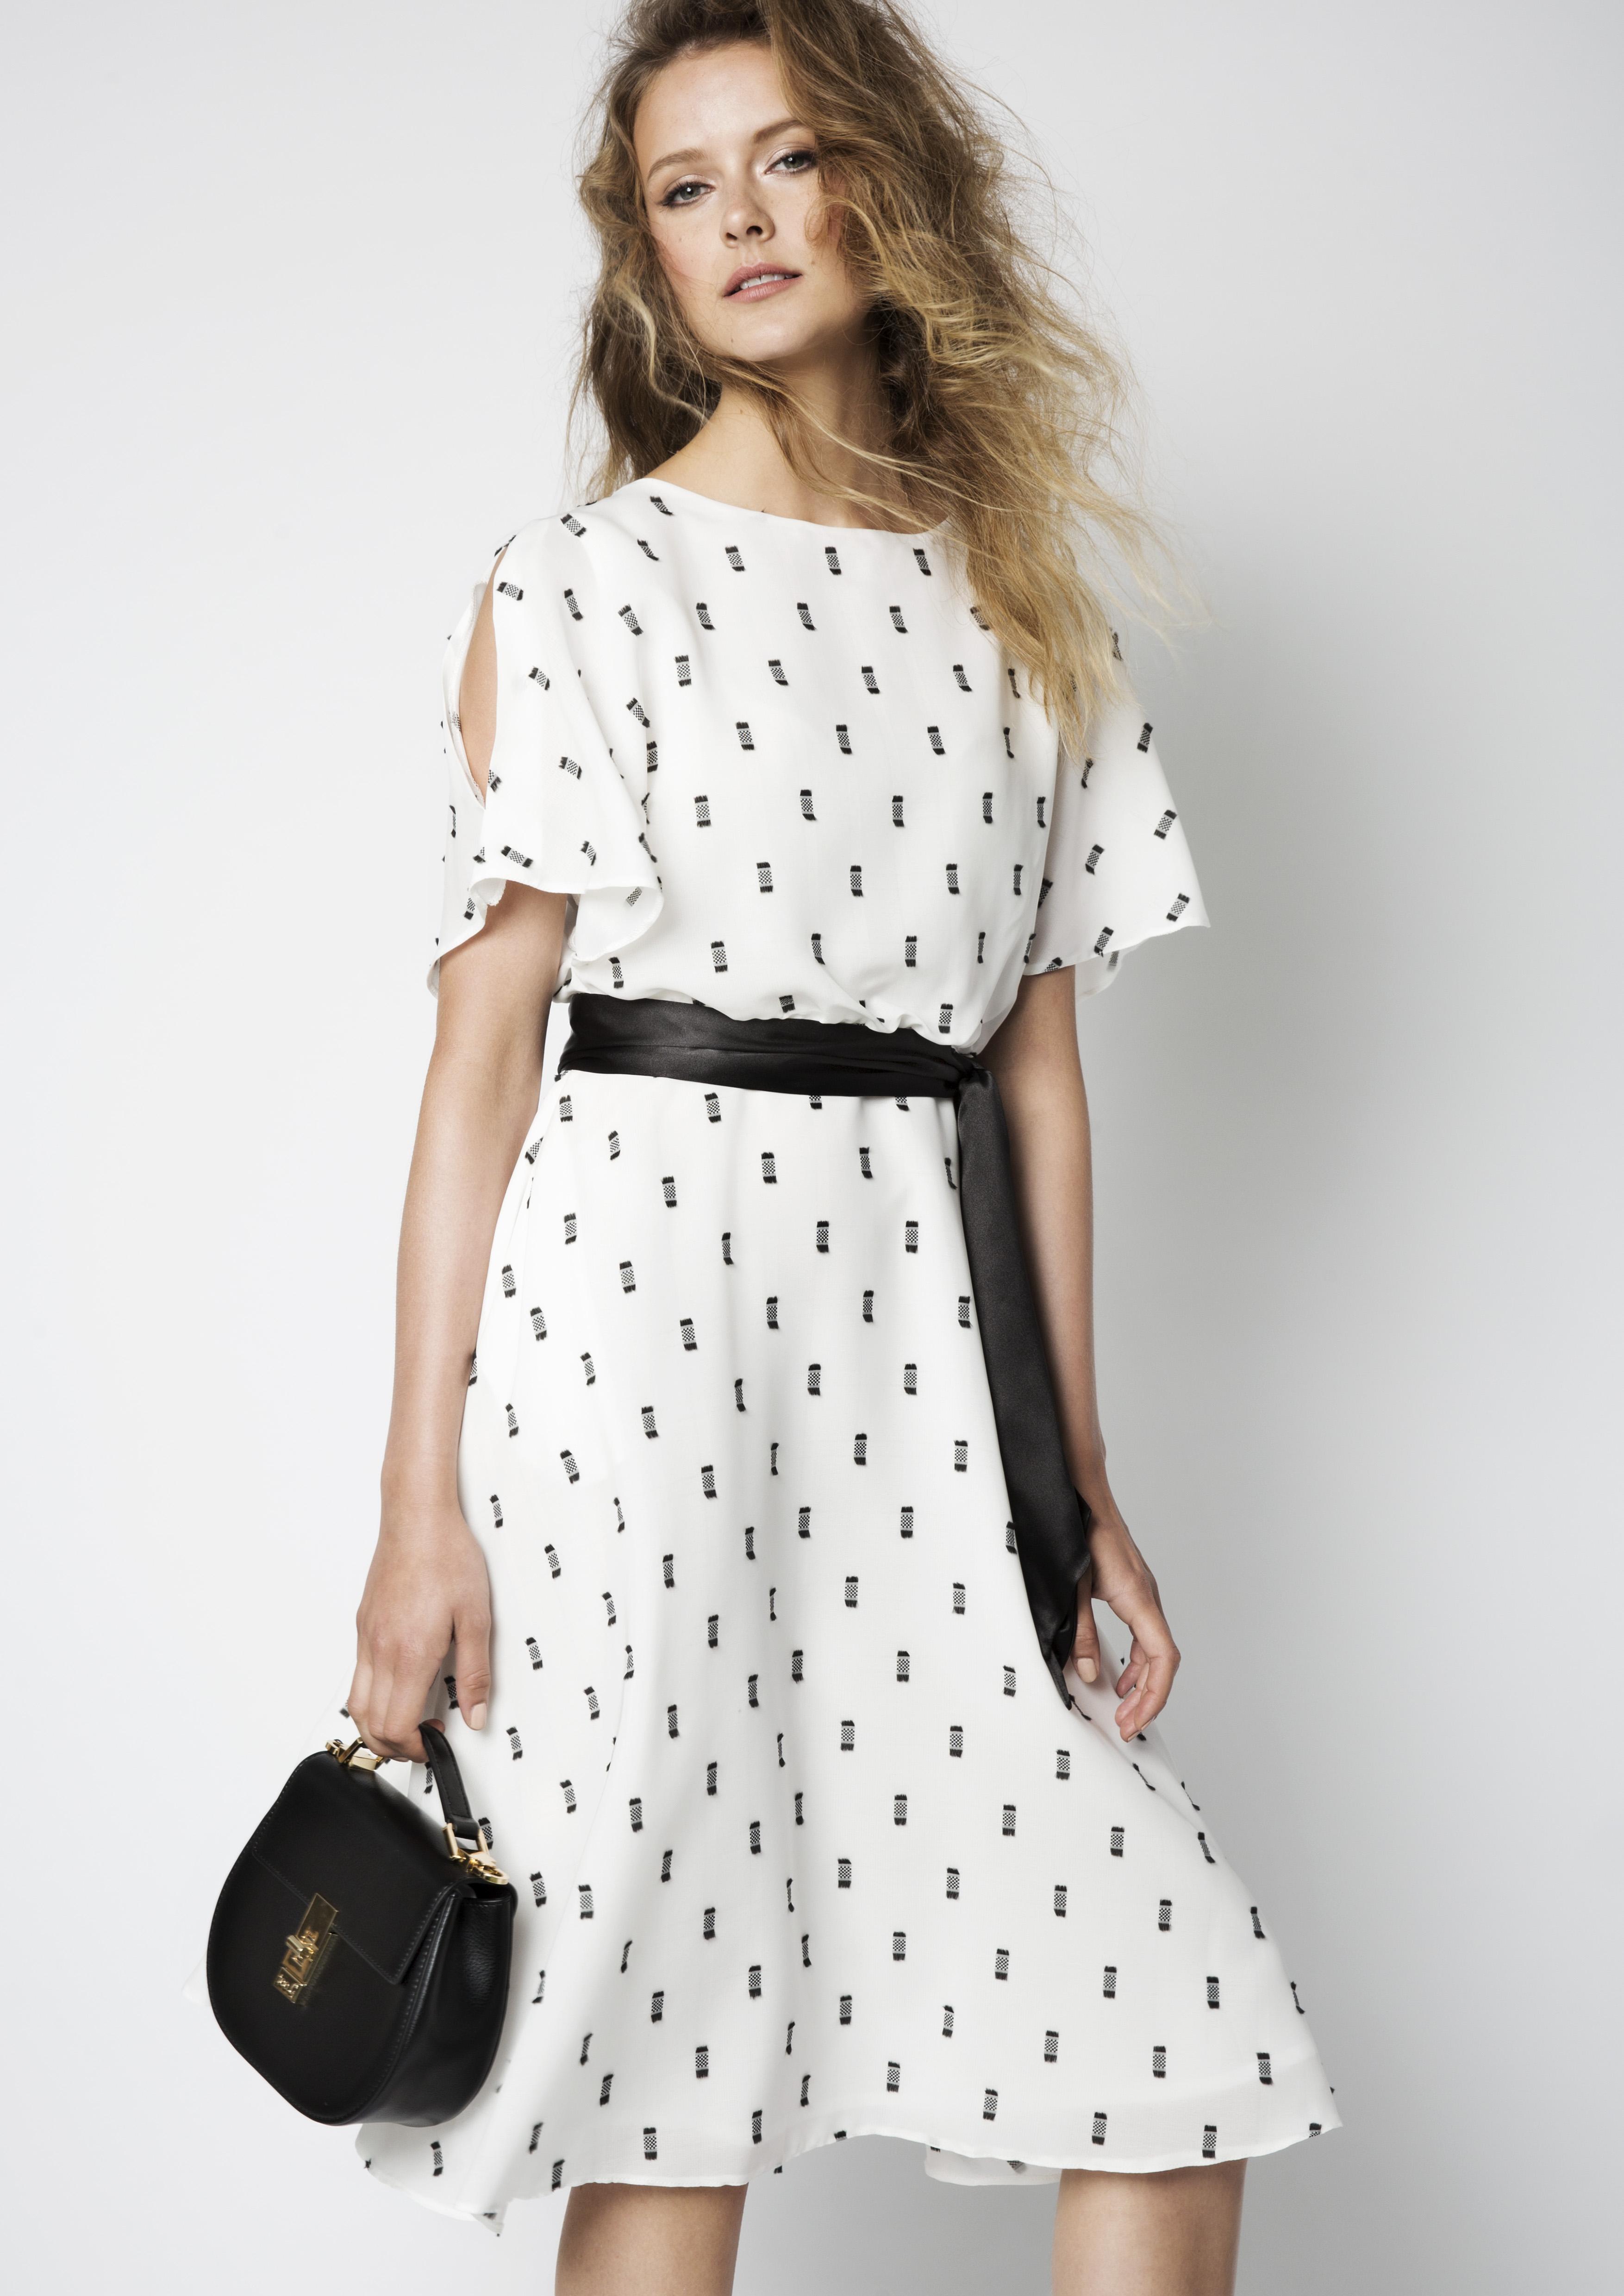 https://www.anastasiashop.com/fee-g-garden-party-dress/